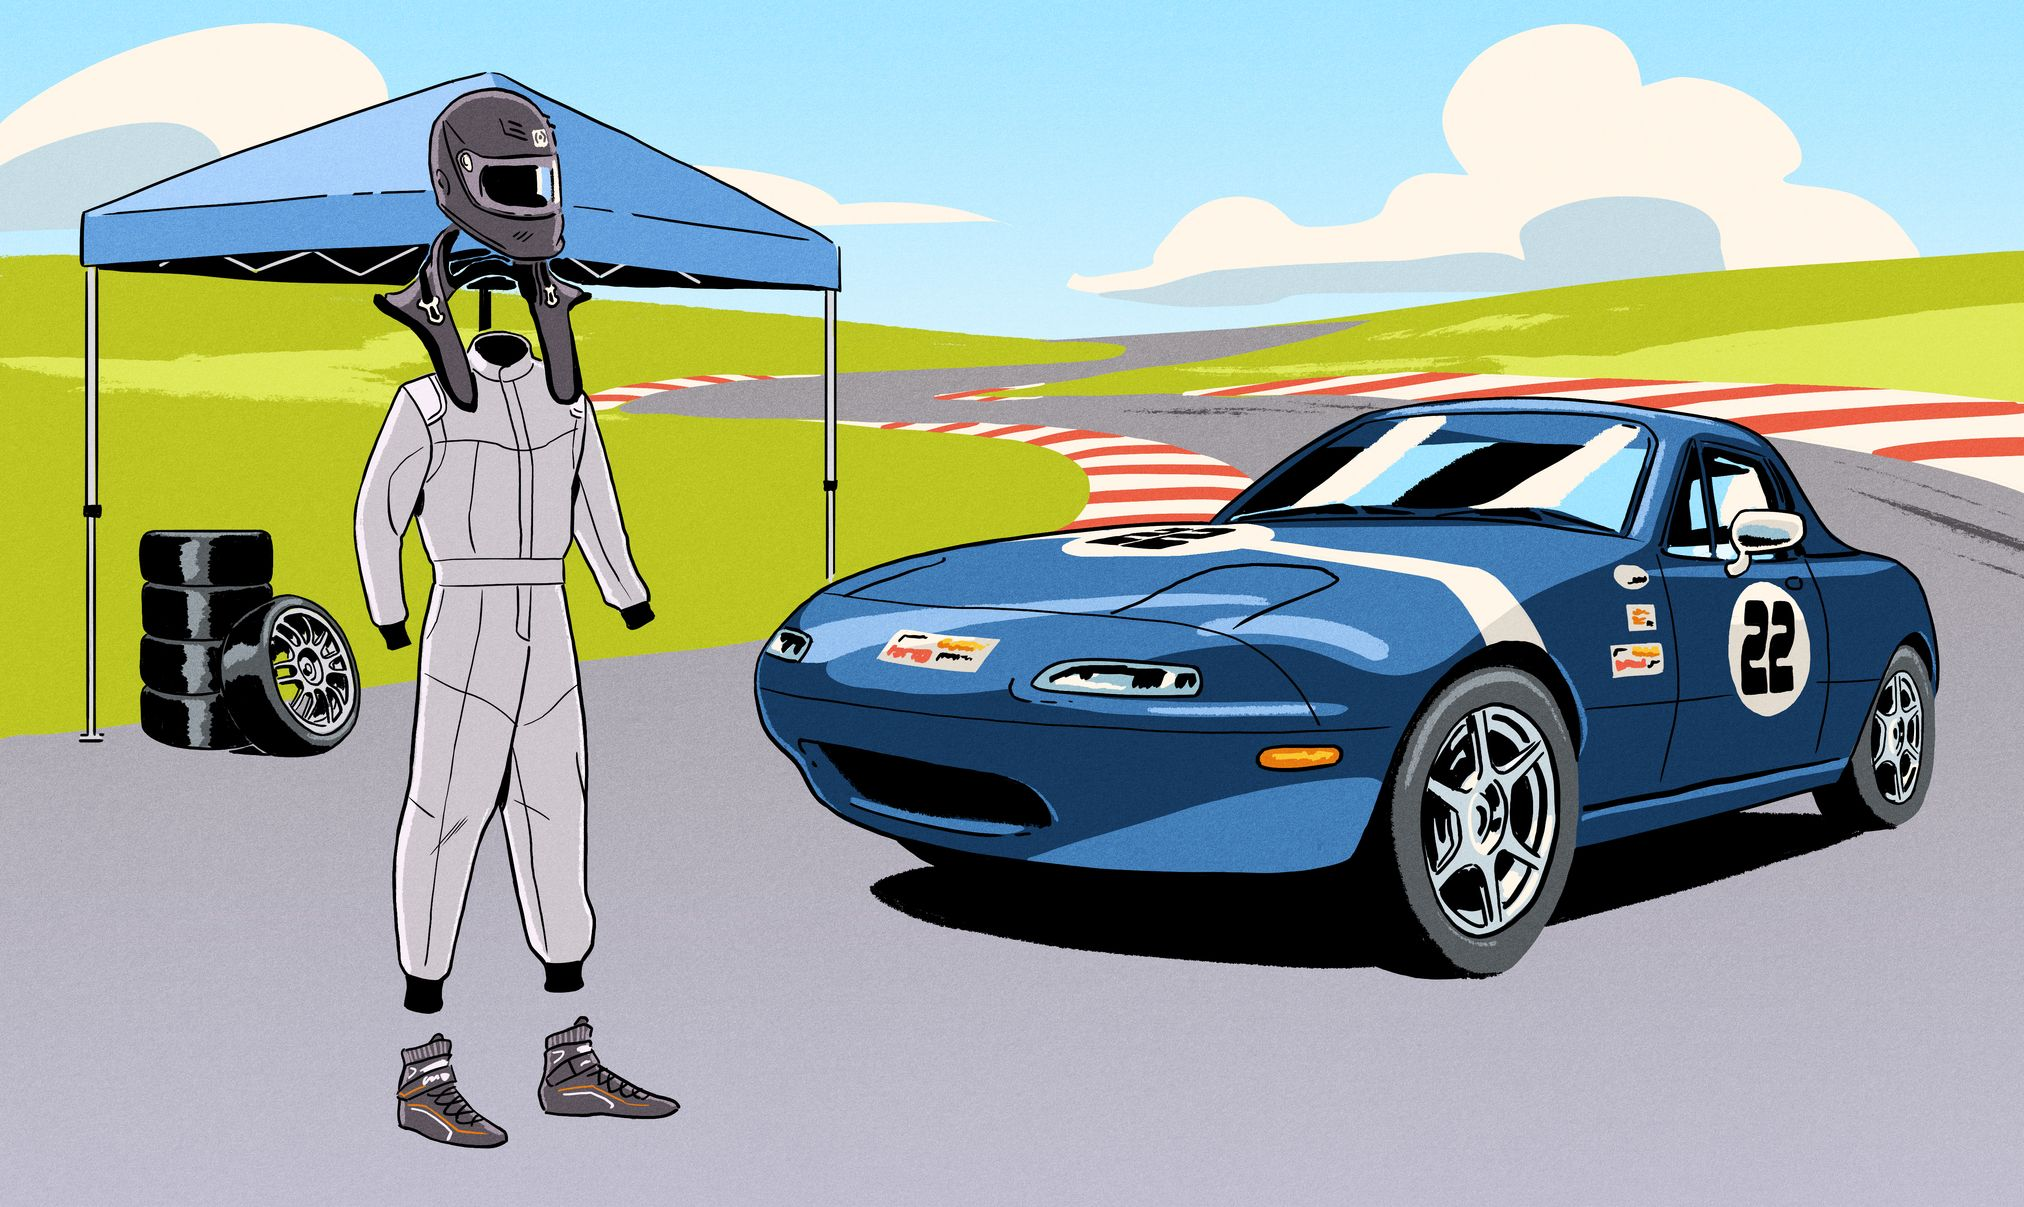 garance-illustration-COST-OF-RACING-MIATA-FINAL_web